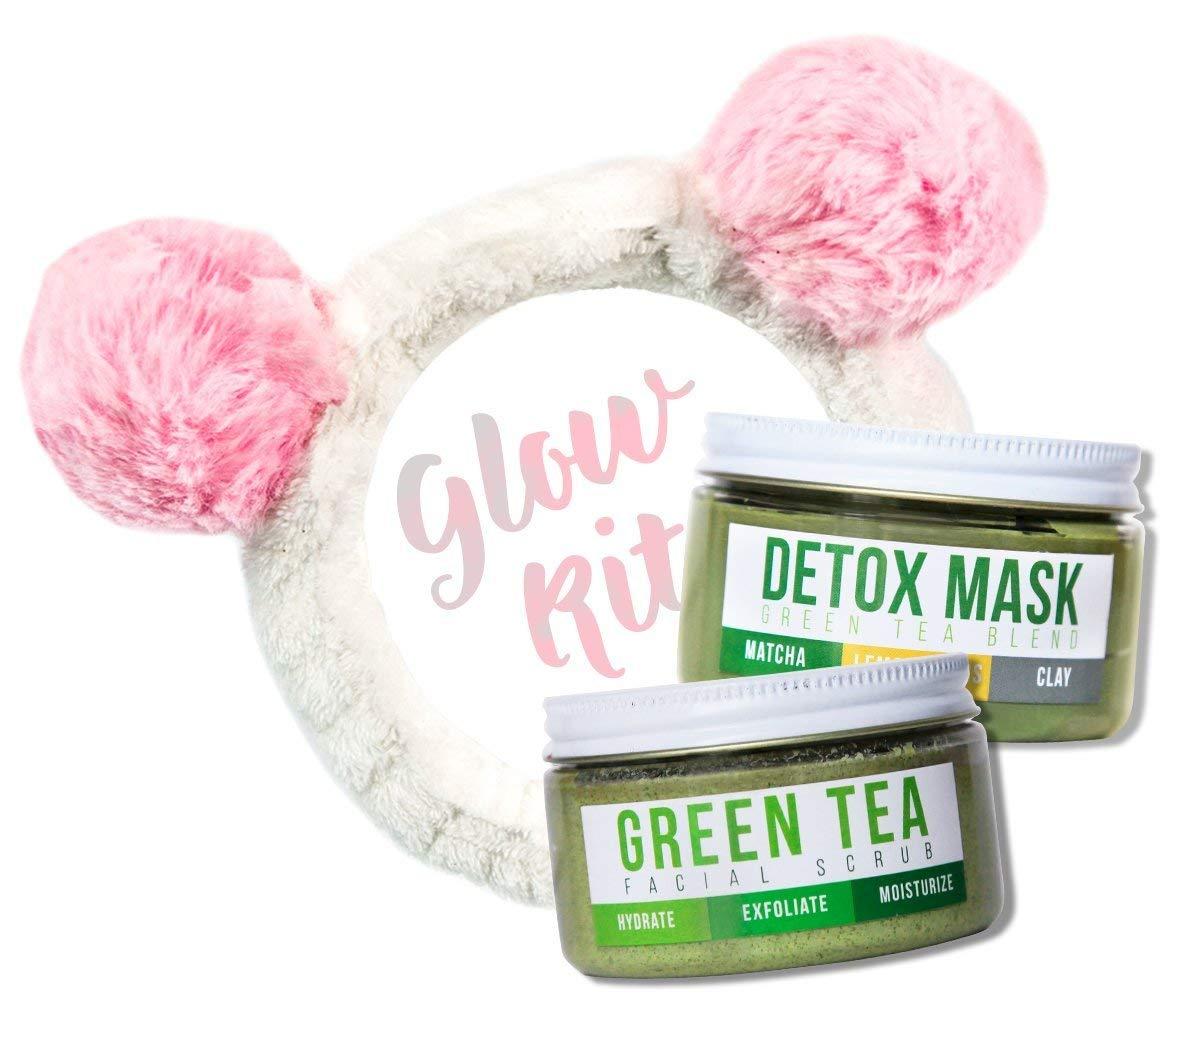 GREEN TEA DETOX FACE SCRUB & MASK By Teami | Organic Facial Scrubs Exfoliate, Hydrate, Moisturize All Skin Types | Uses the Best Exfoliating Sugar | Cleanse Skin (Glow Kit w/Bonus Headband)